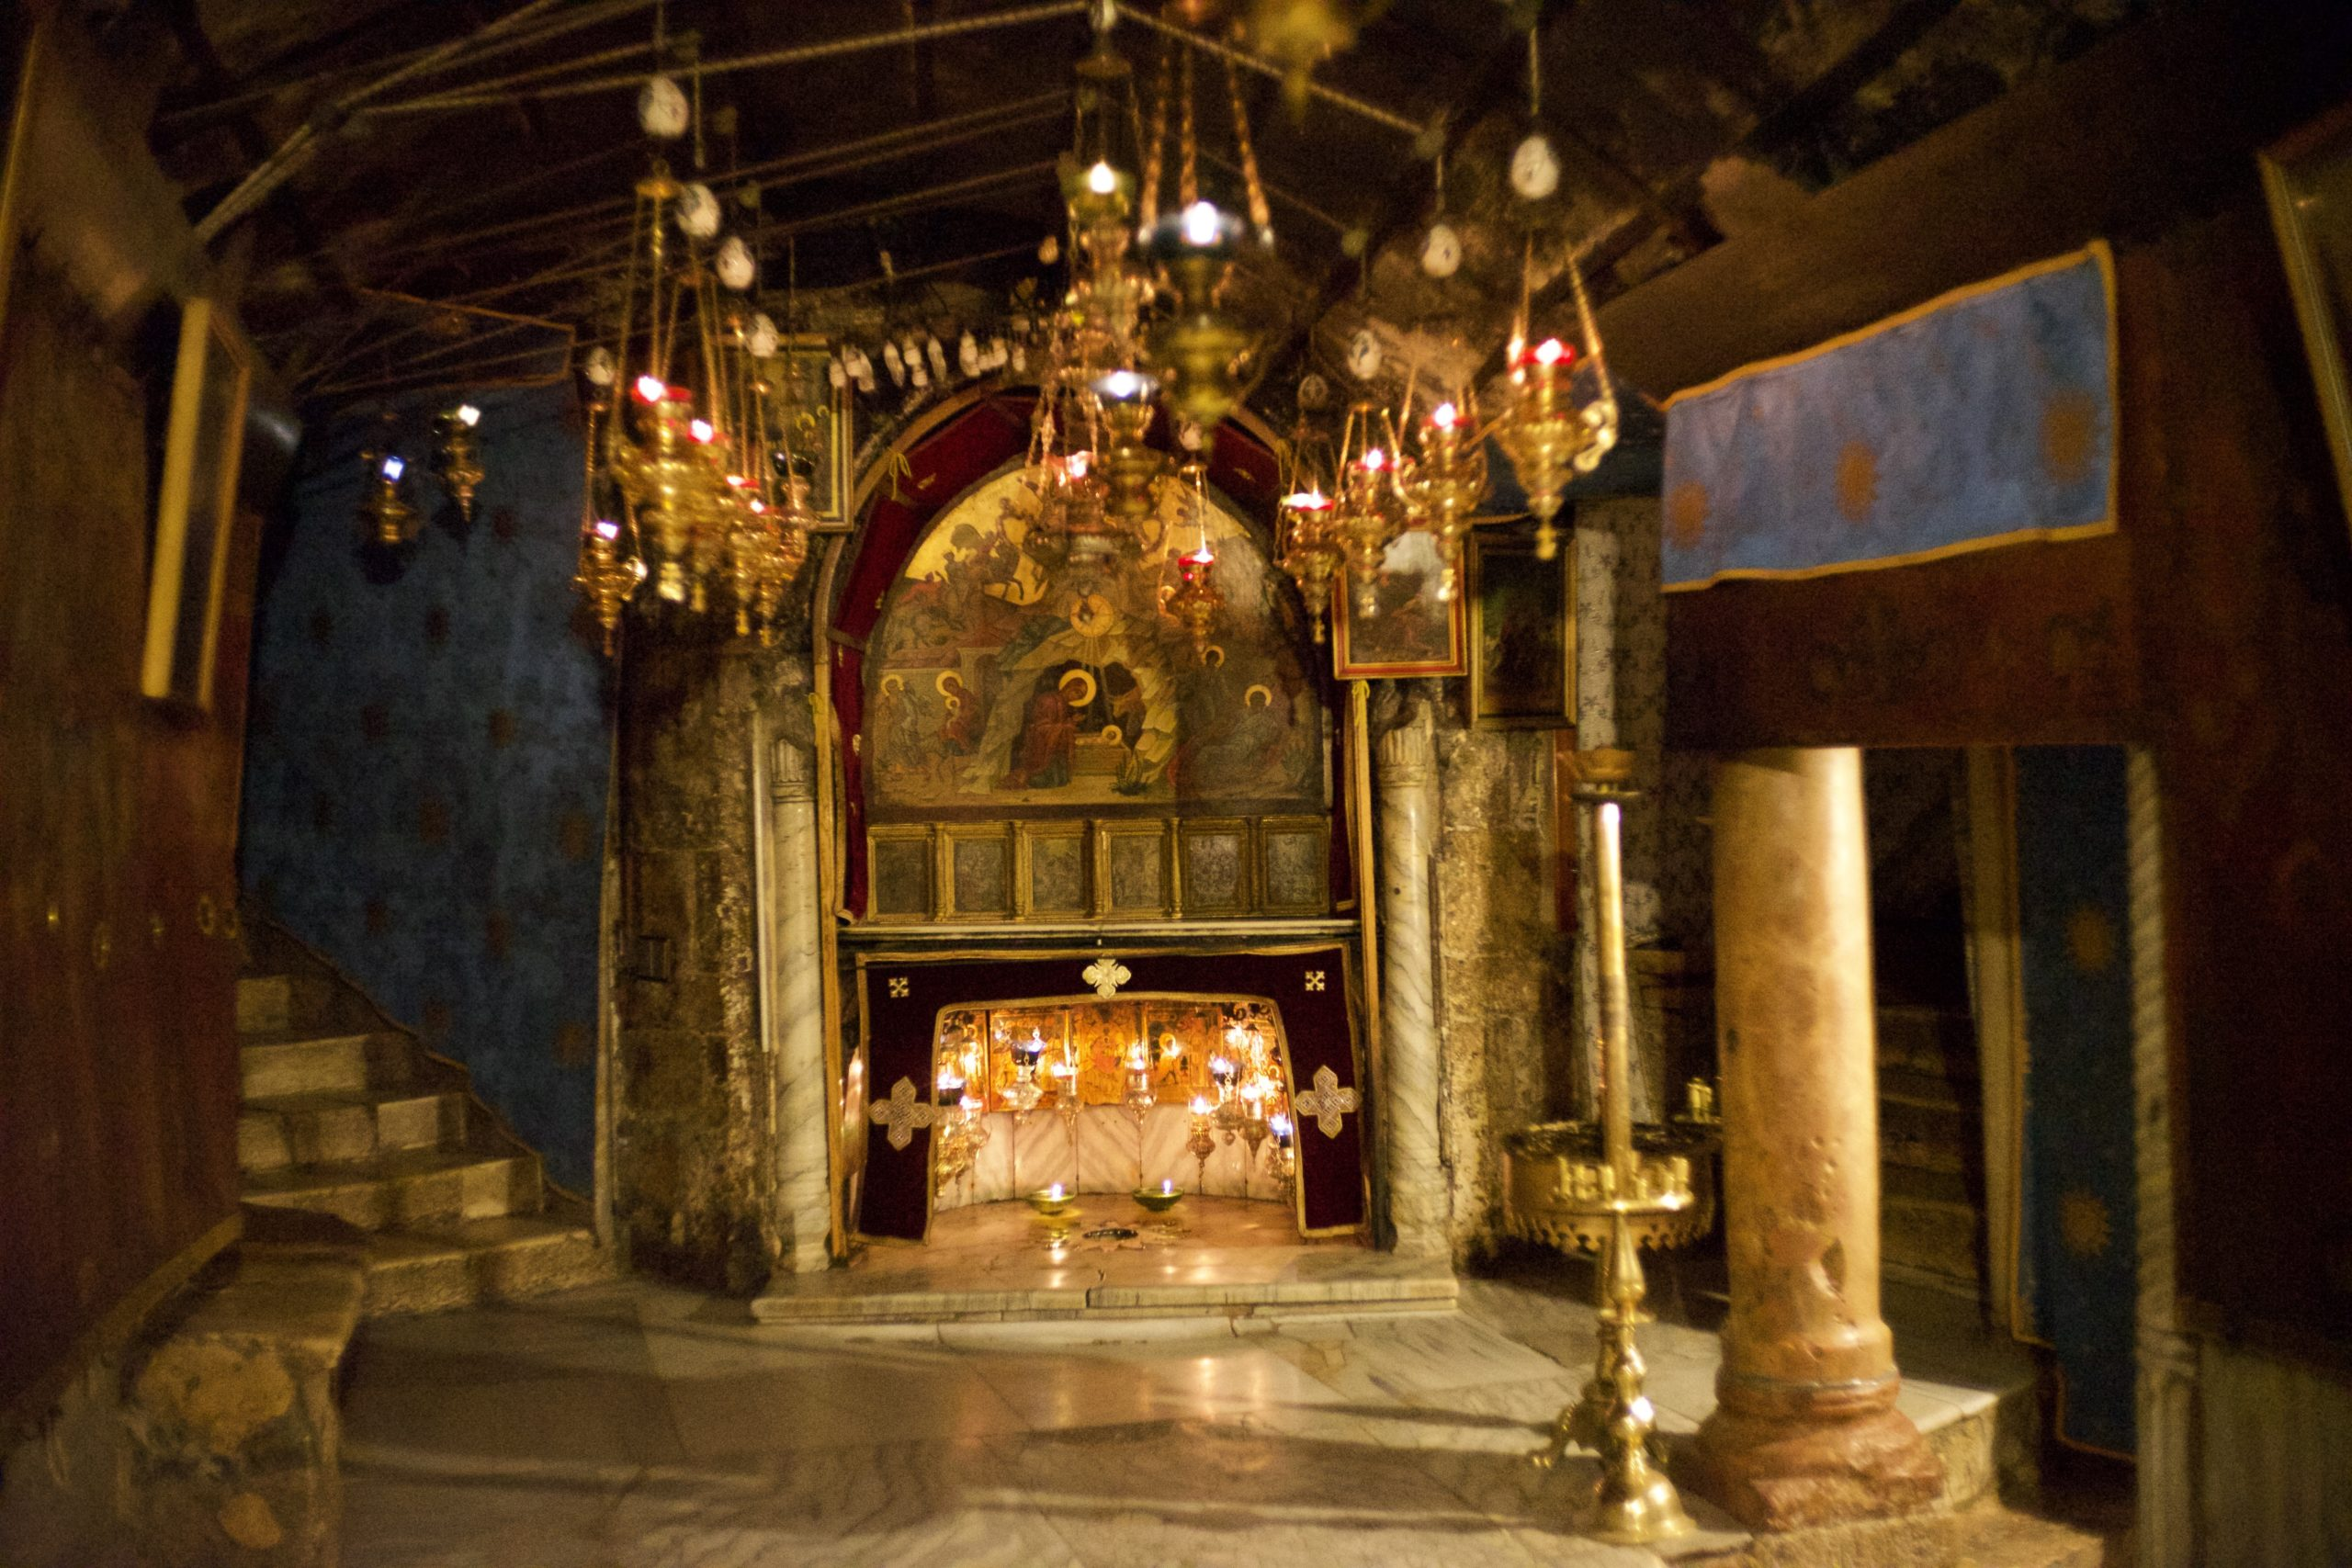 FAKTA: Fødselskirken i Betlehem